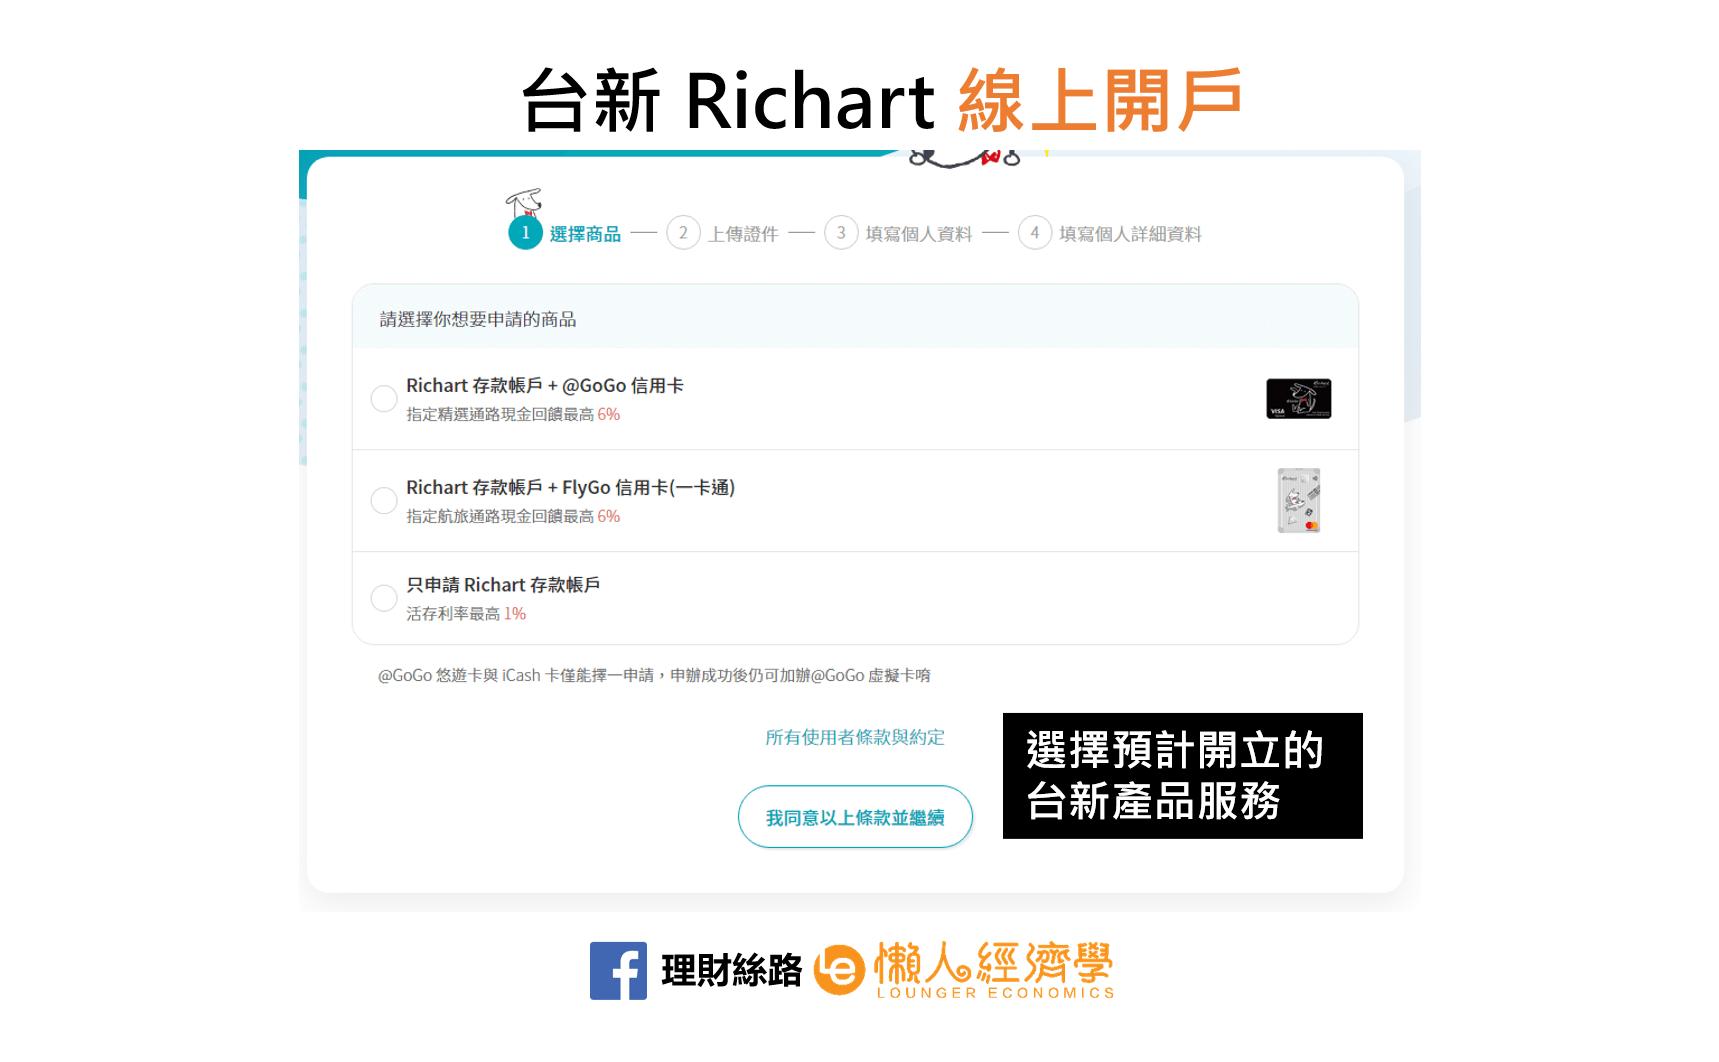 richart 開戶教學